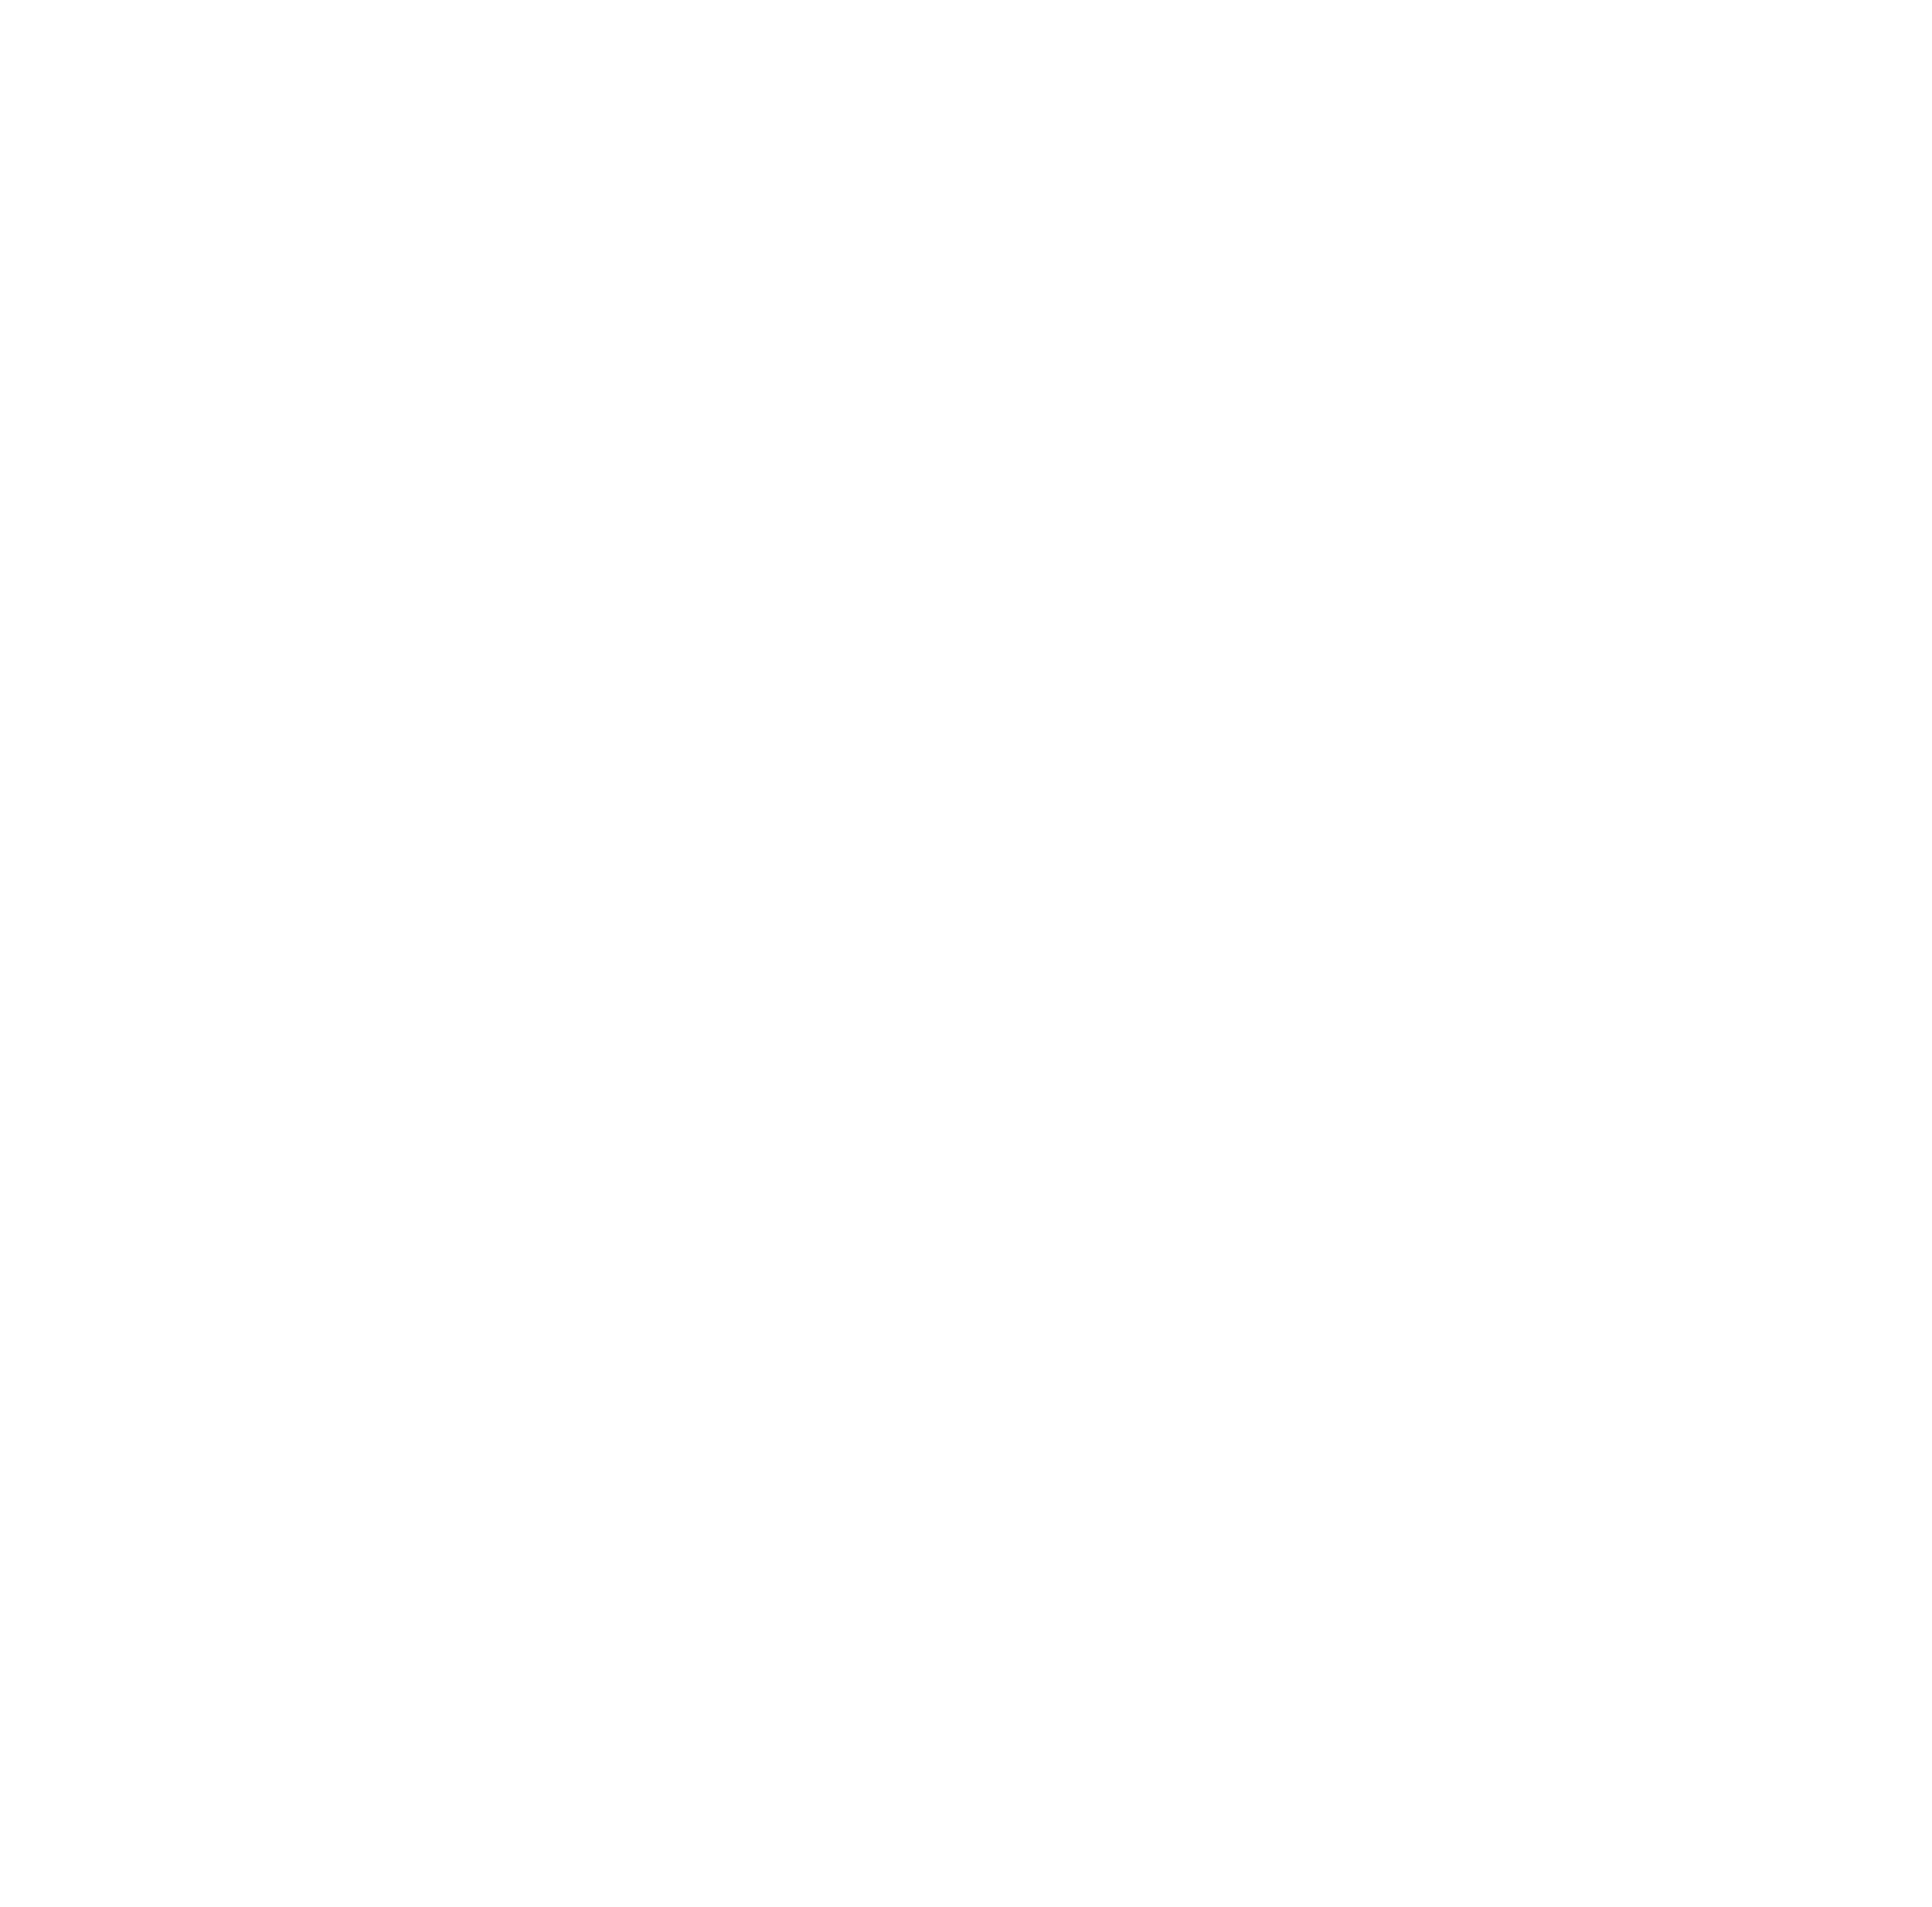 White border png transparency. Frame transparent clip art